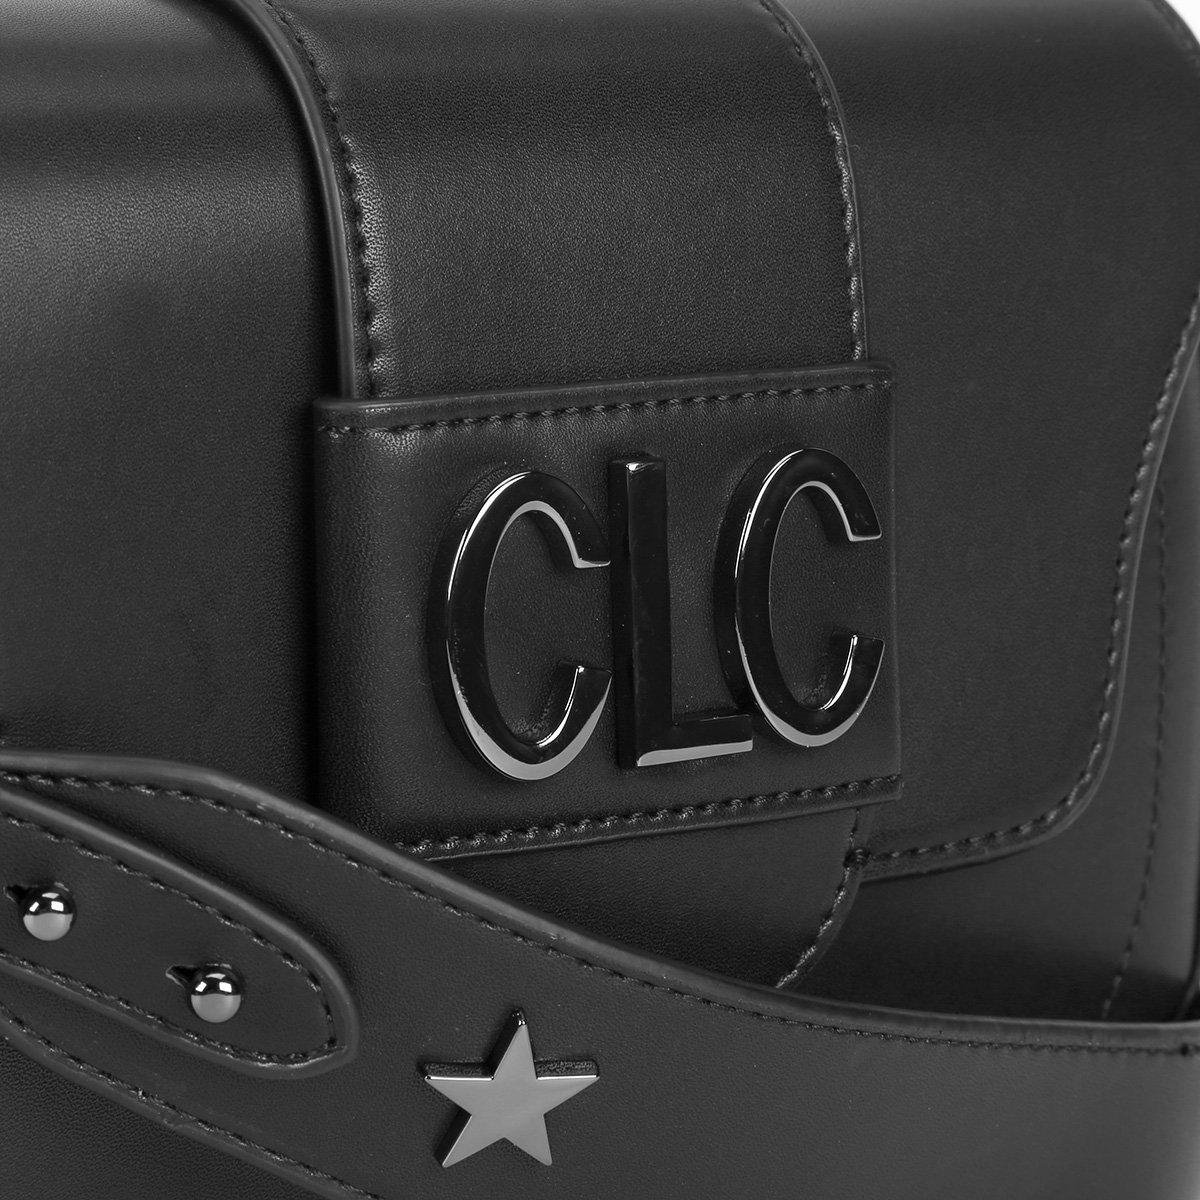 18188f043 Bolsa Colcci Flap com Logo Feminina - Compre Agora | Zattini